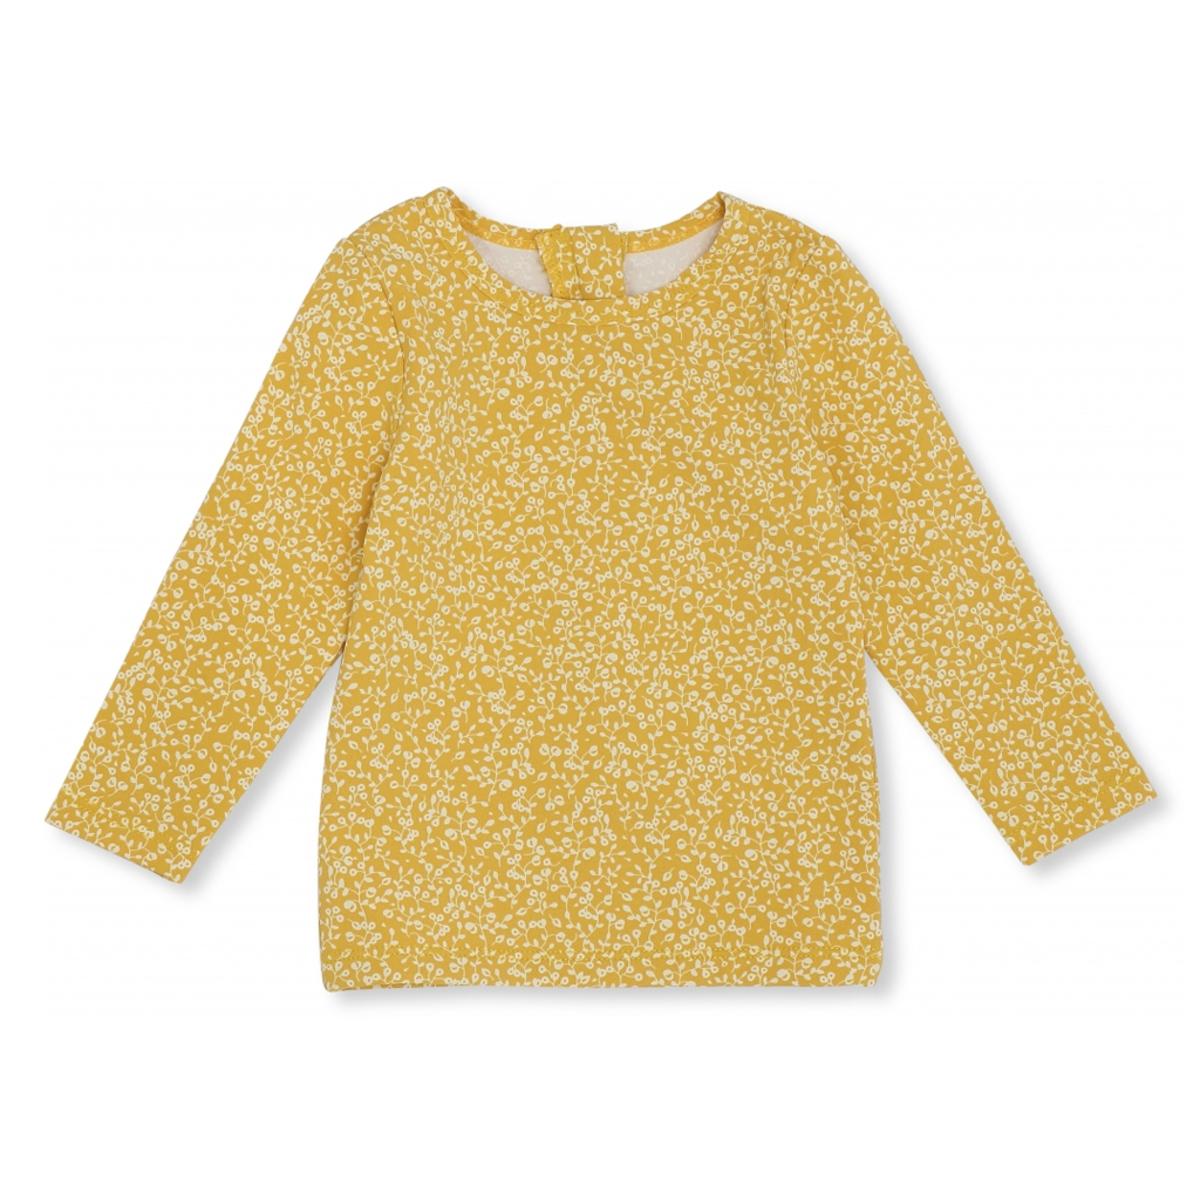 Haut bébé Tee-Shirt Anti-UV Blossom Mist - 12/18 Mois Tee-Shirt Anti-UV Blossom Mist - 12/18 Mois